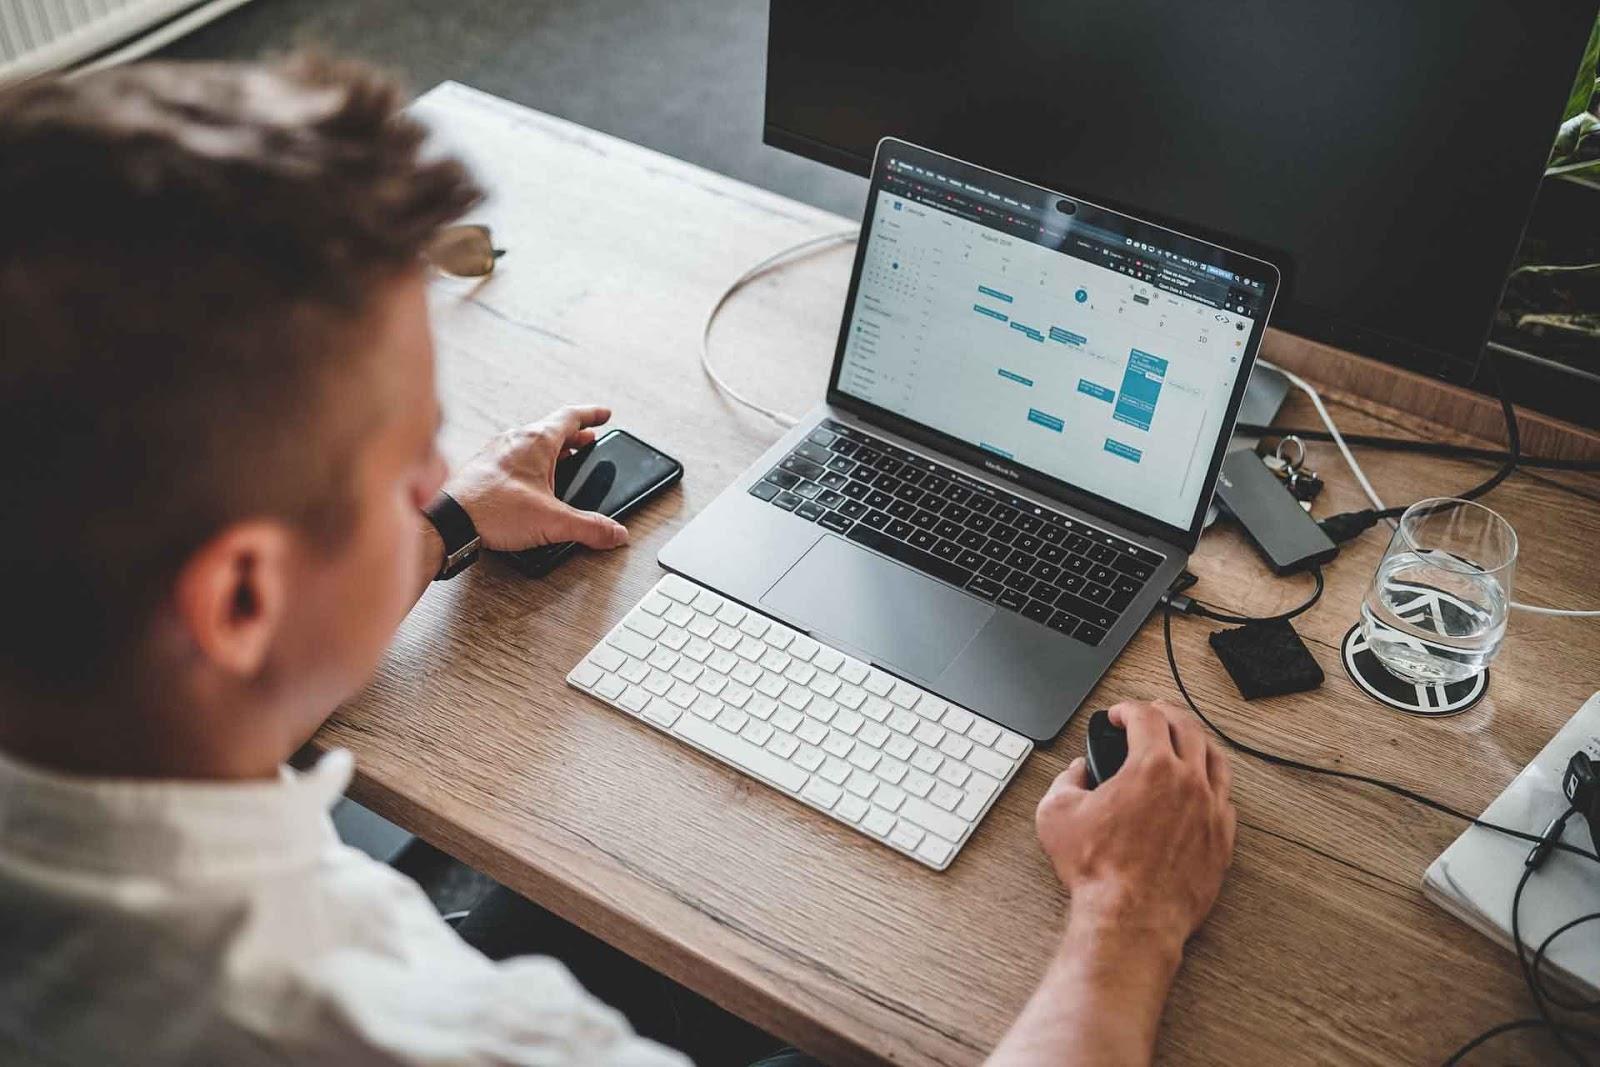 5 Websites To Make Money Online For FREE